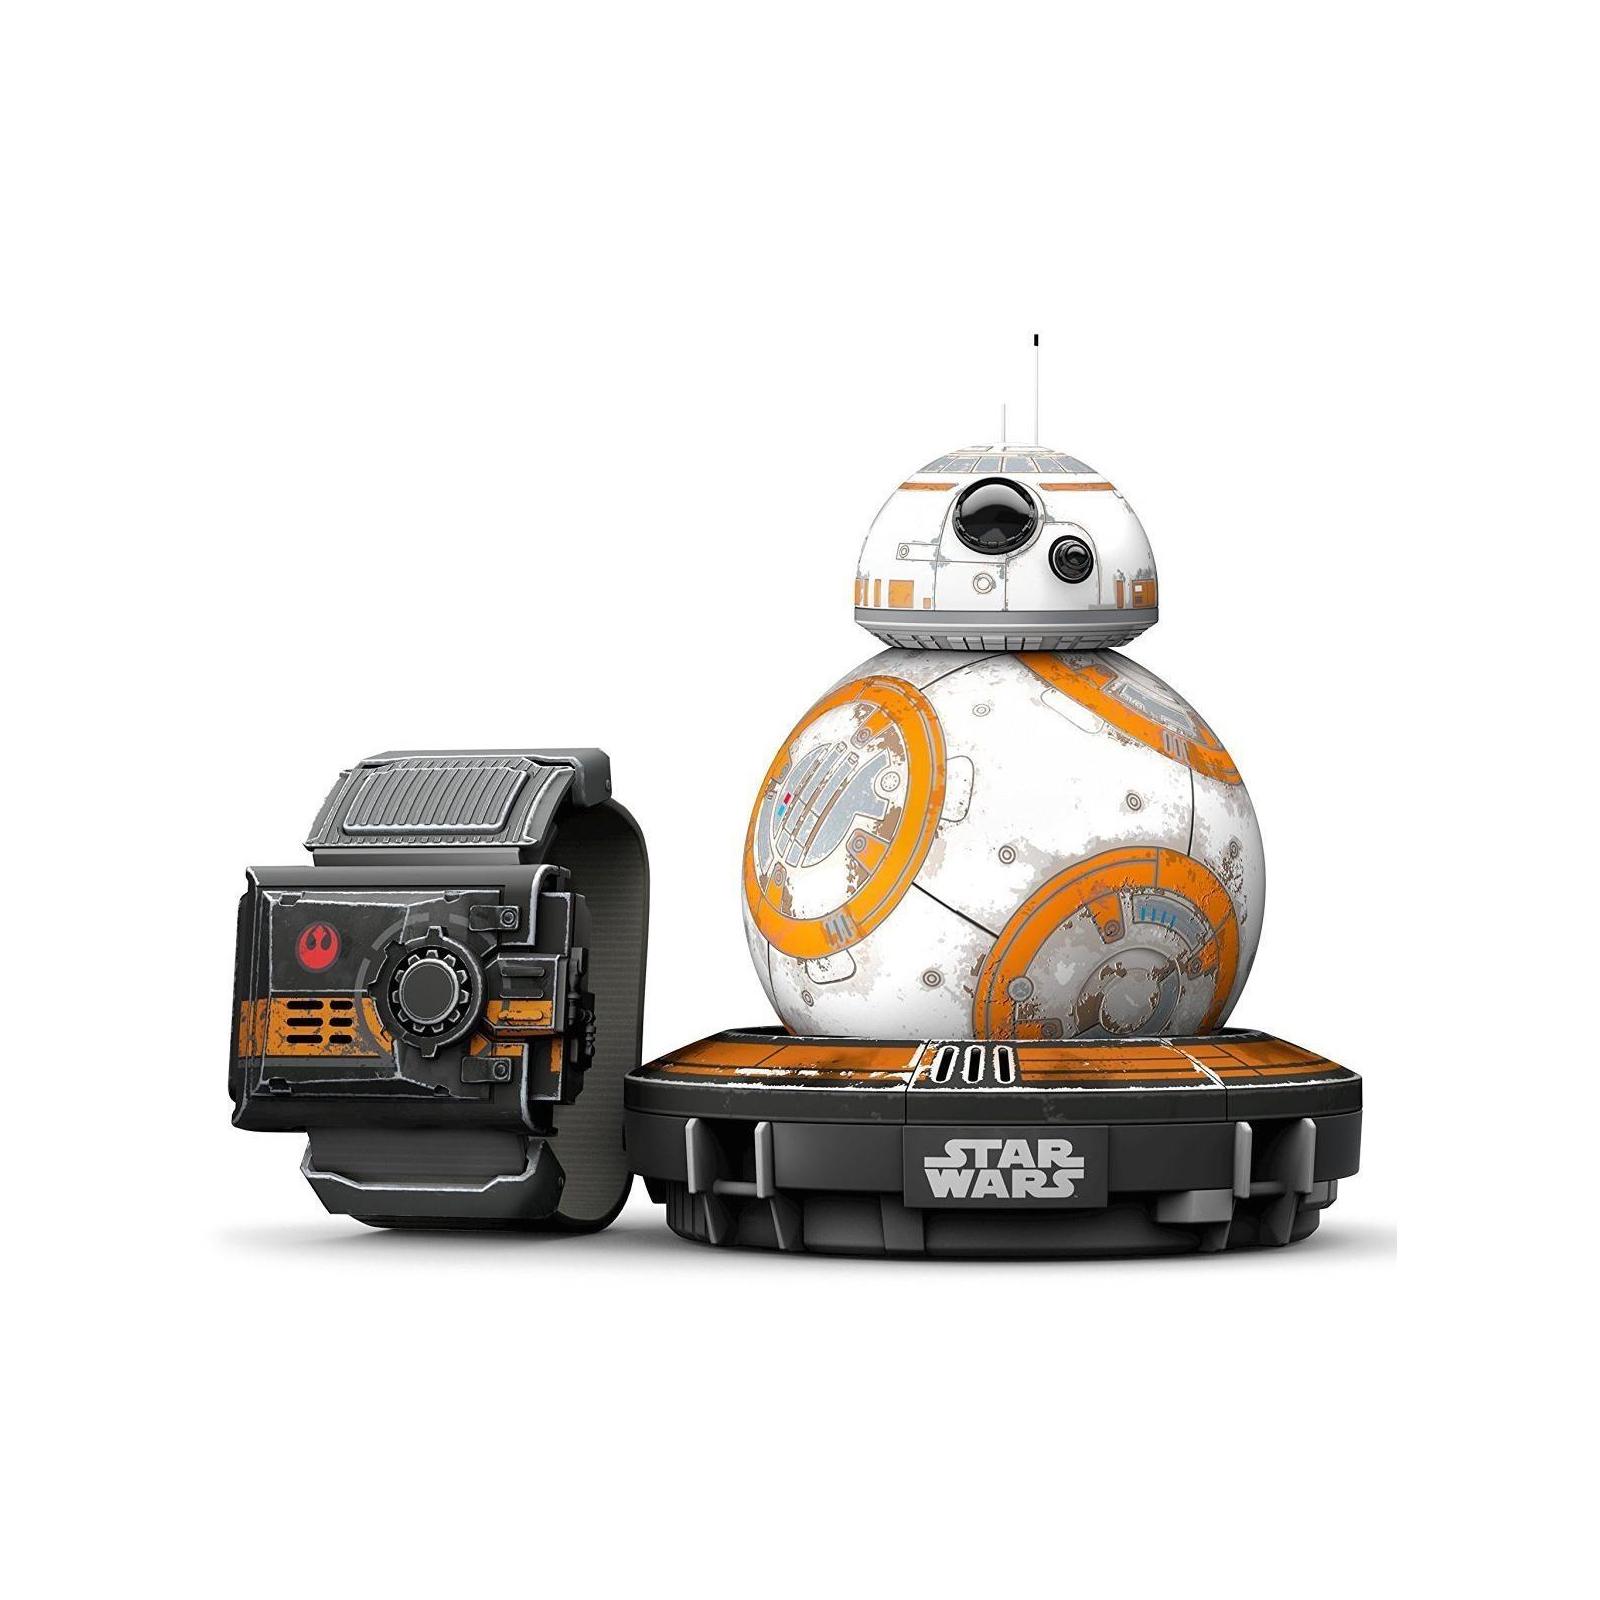 Робот Sphero BB-8 Special Edition with Force Band (322384) изображение 2